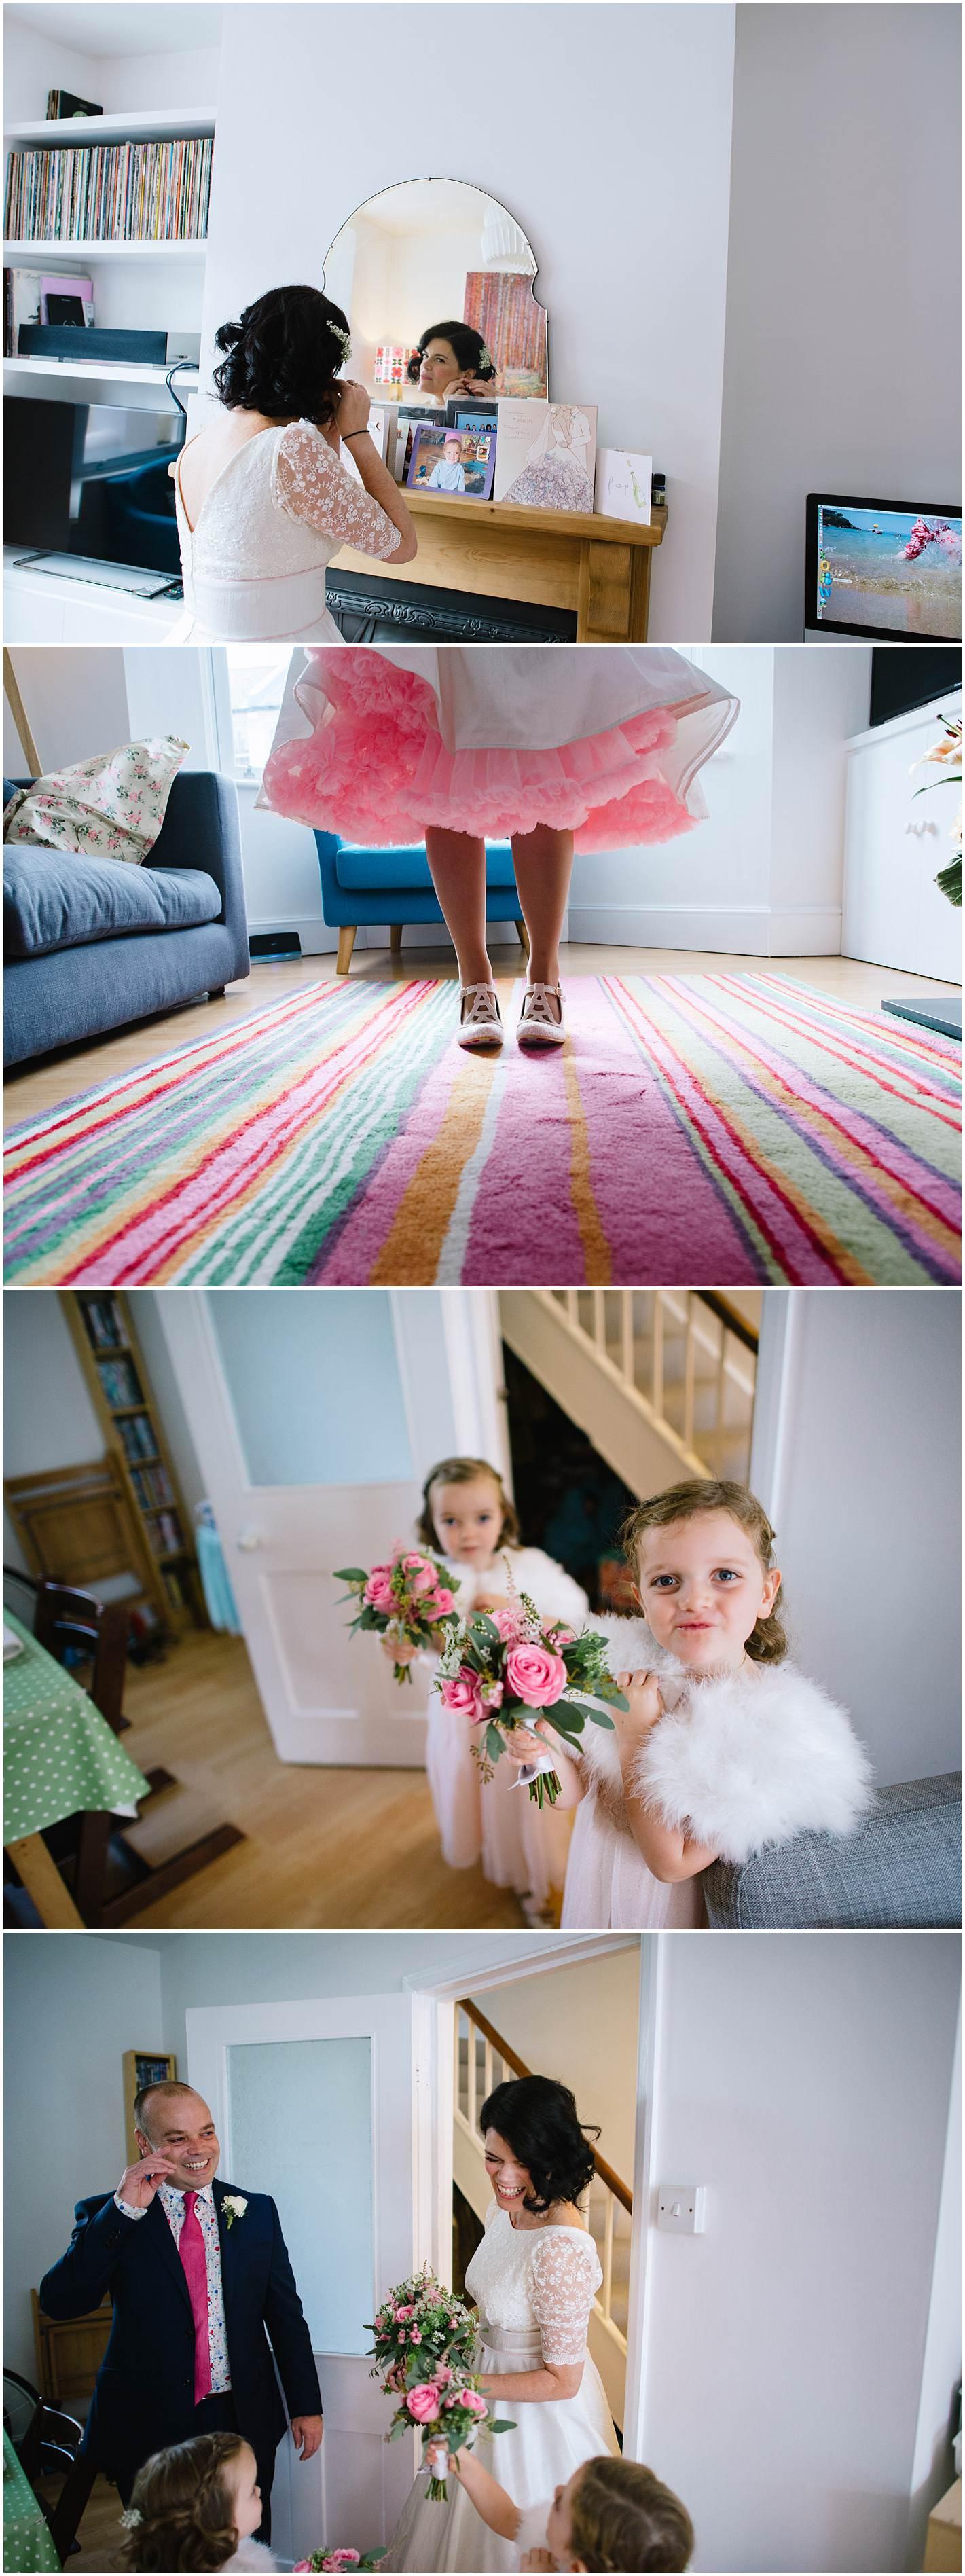 royal-pavilion-wedding-brighton371